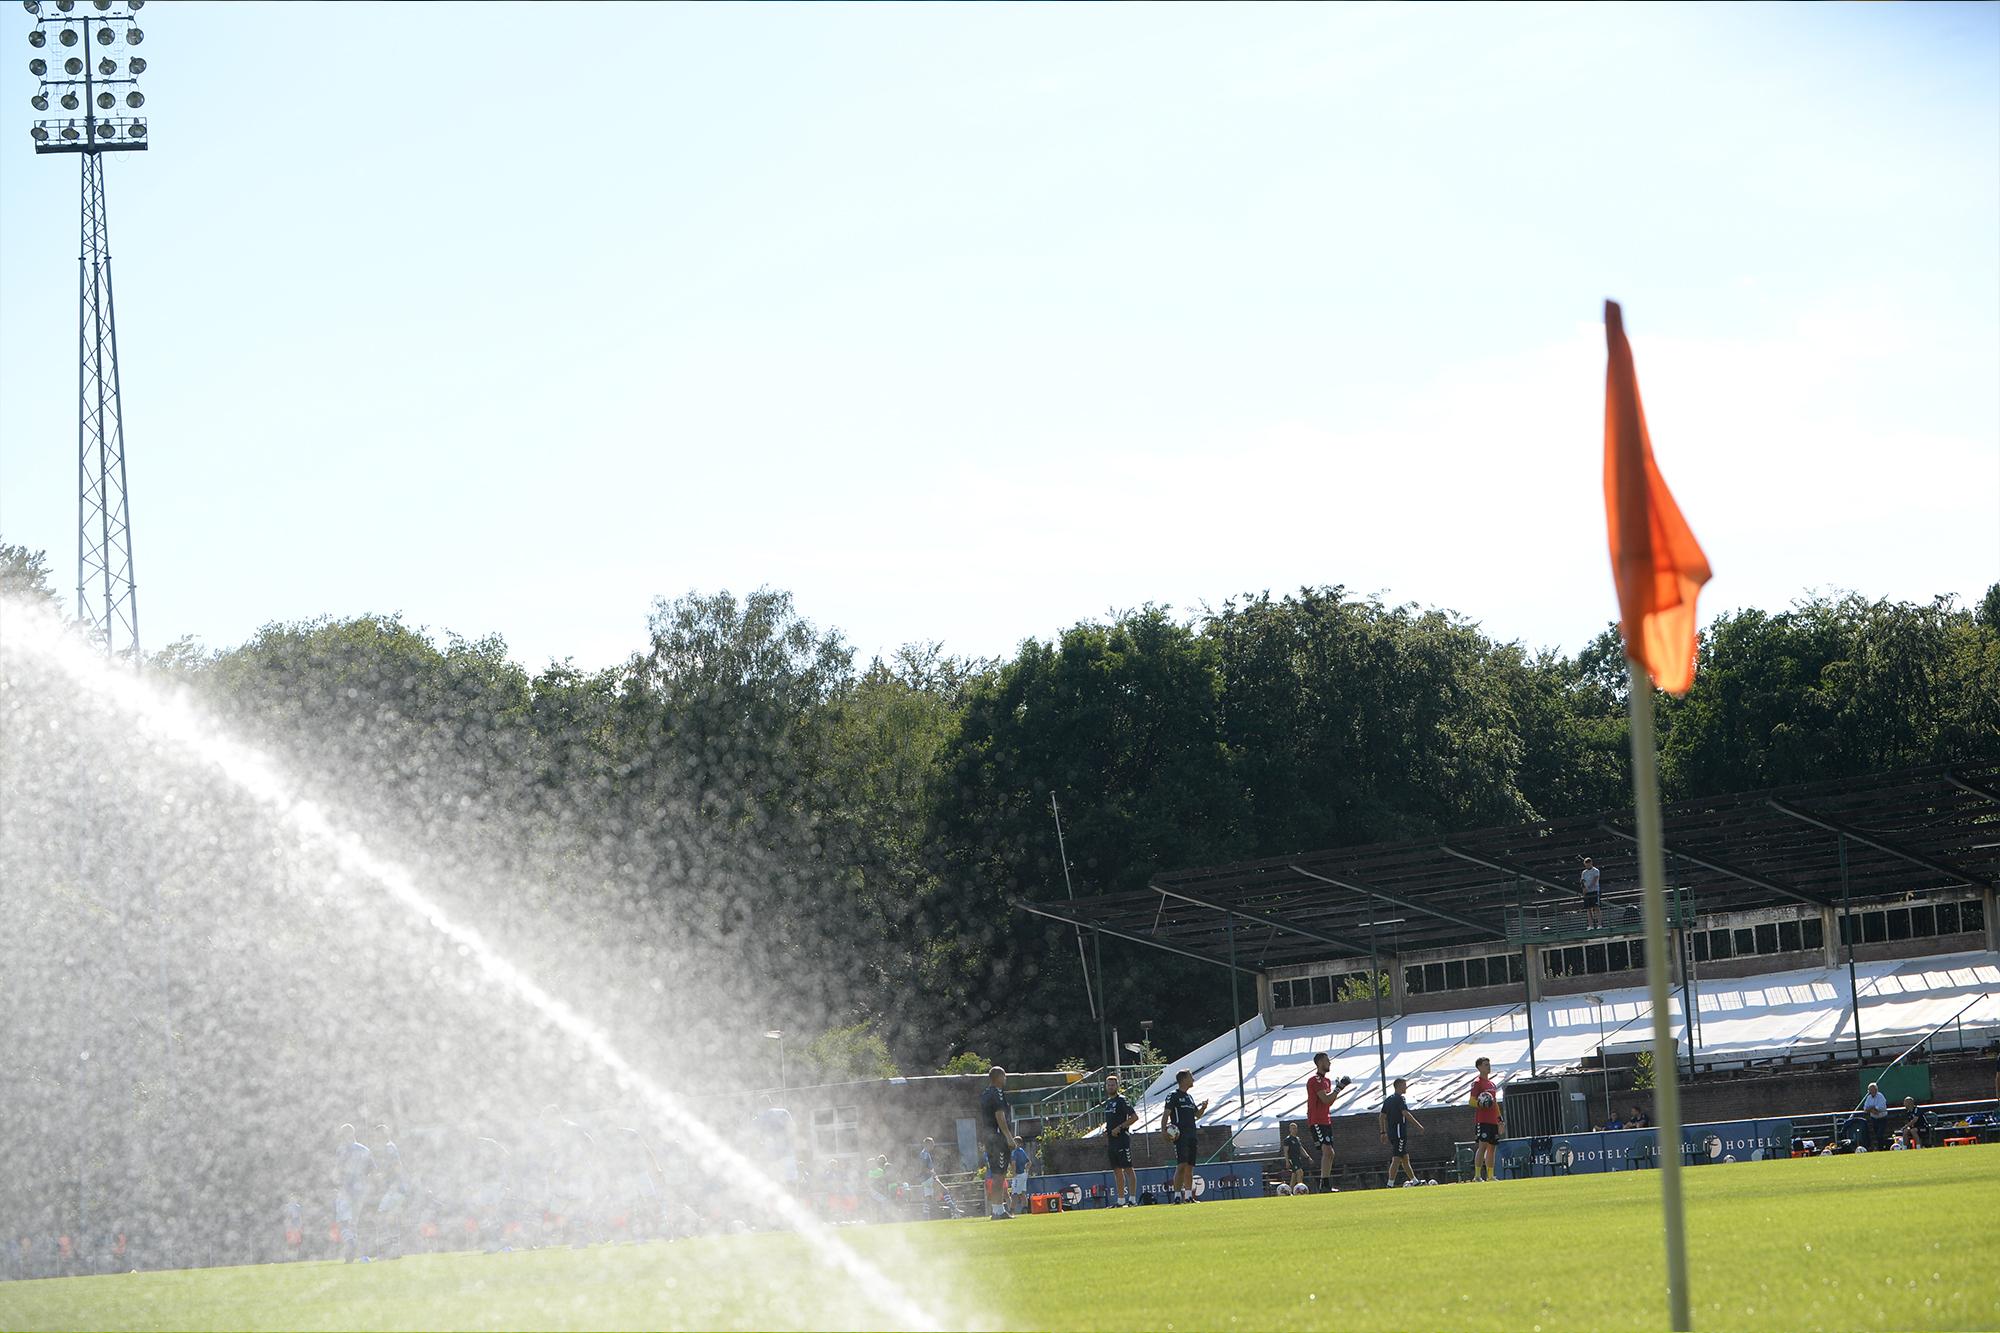 Stadion-vs-Eindhoven.jpg